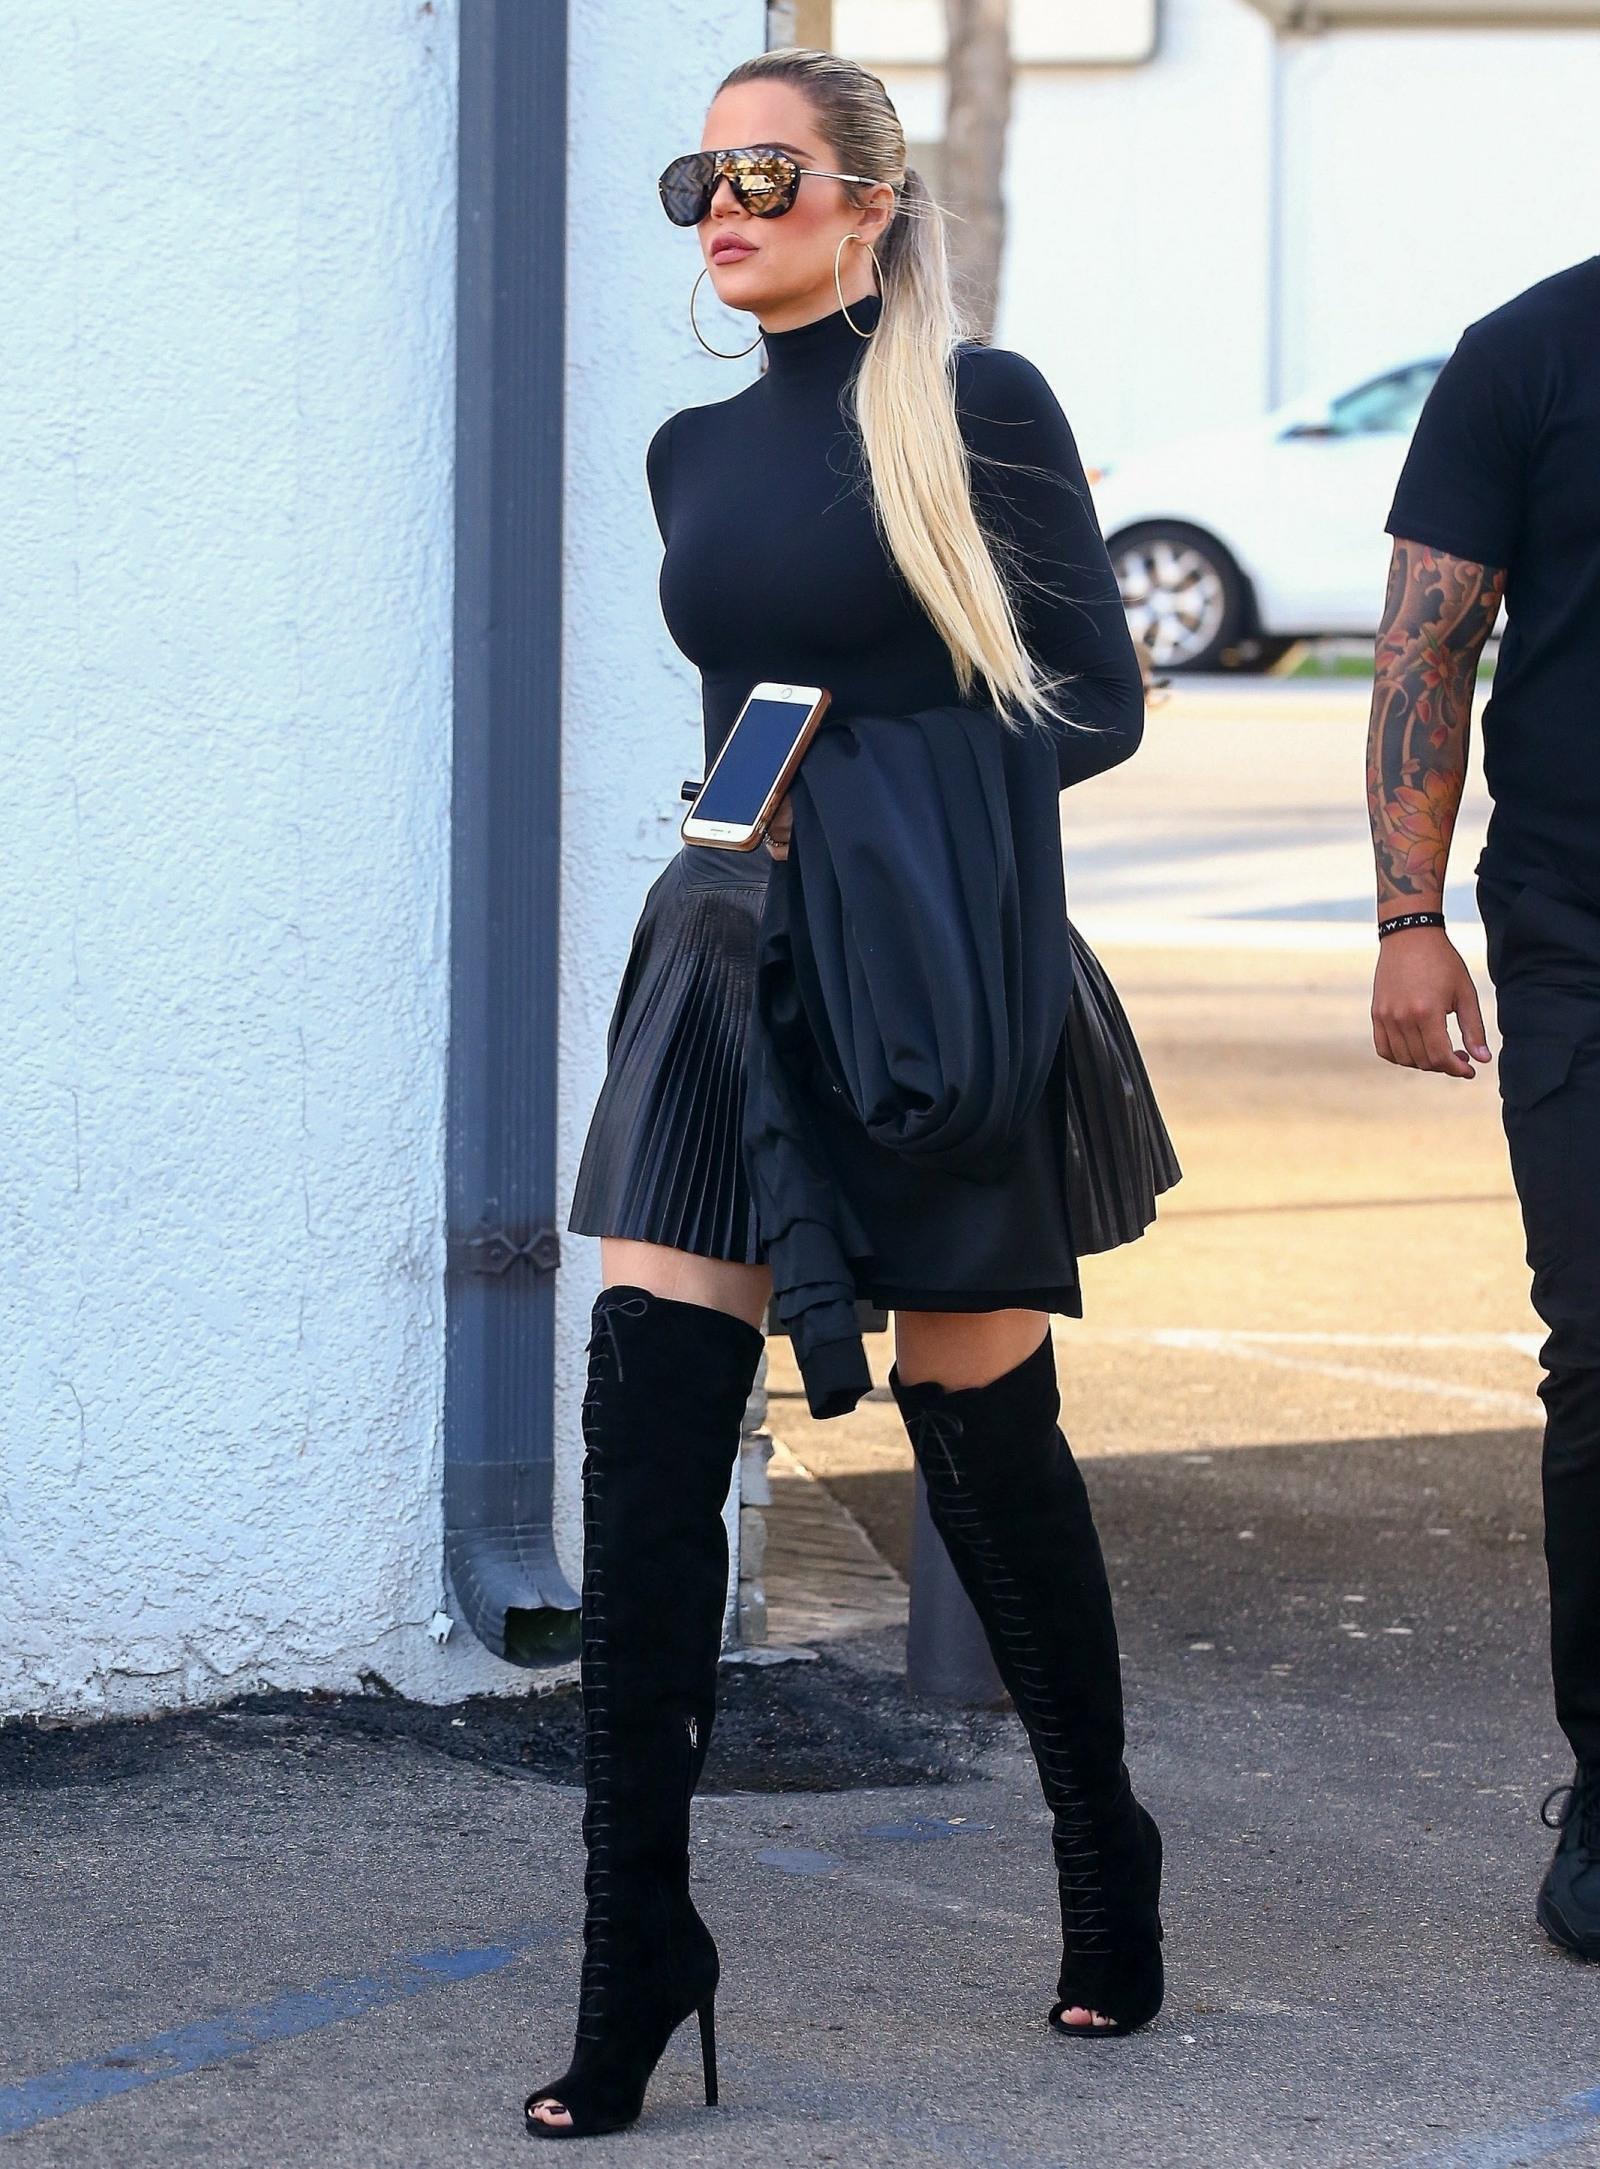 The Kardashian's film at Casa Vega